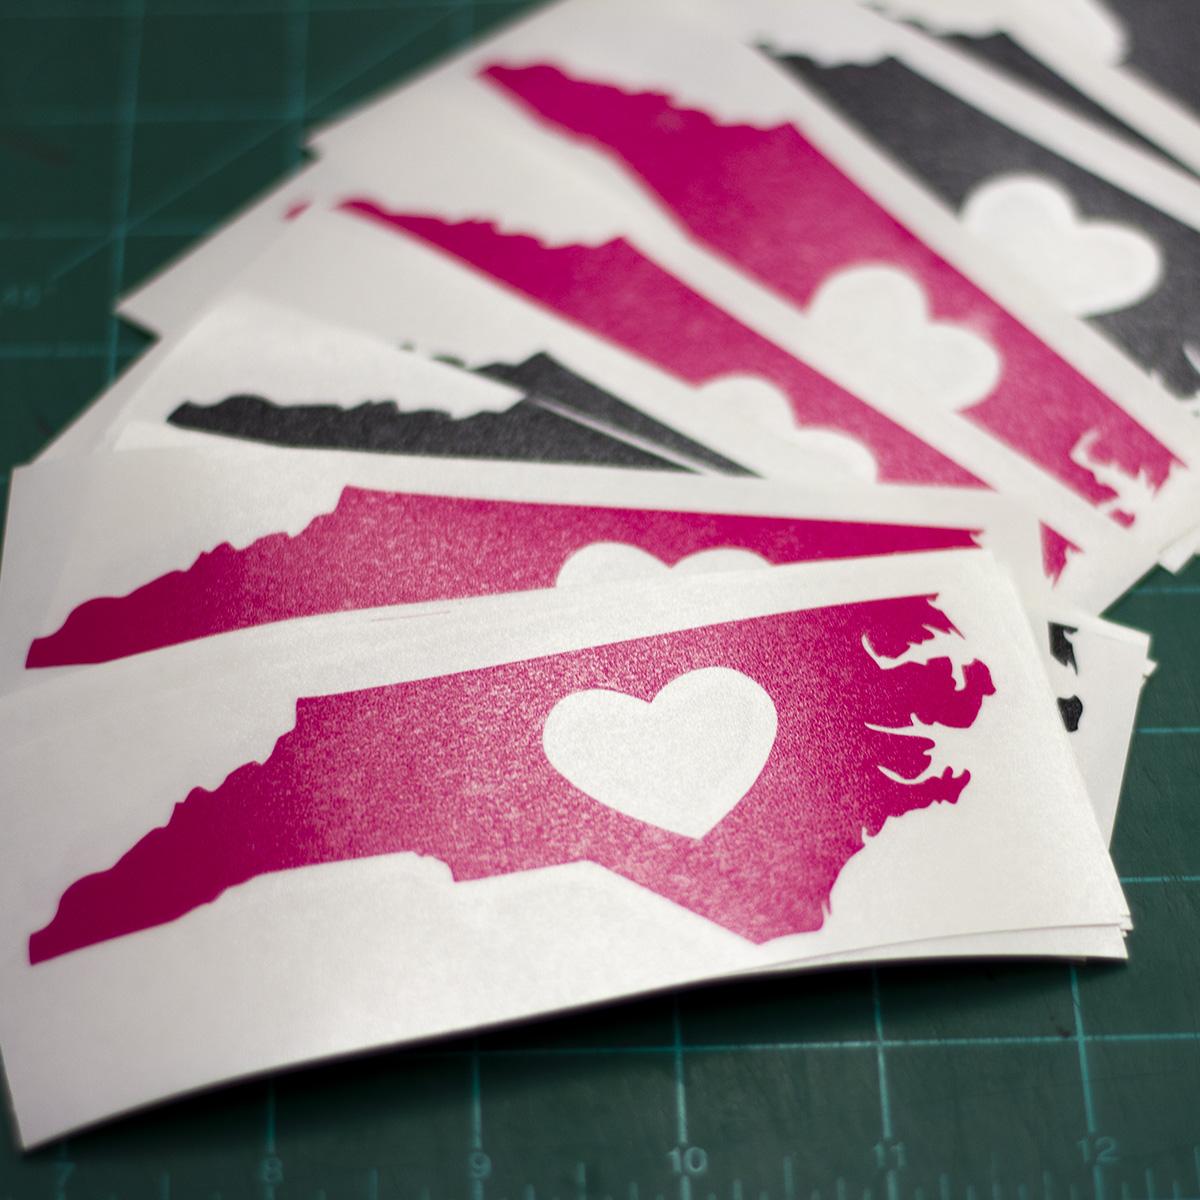 stickers-NC-heart-decals.jpg